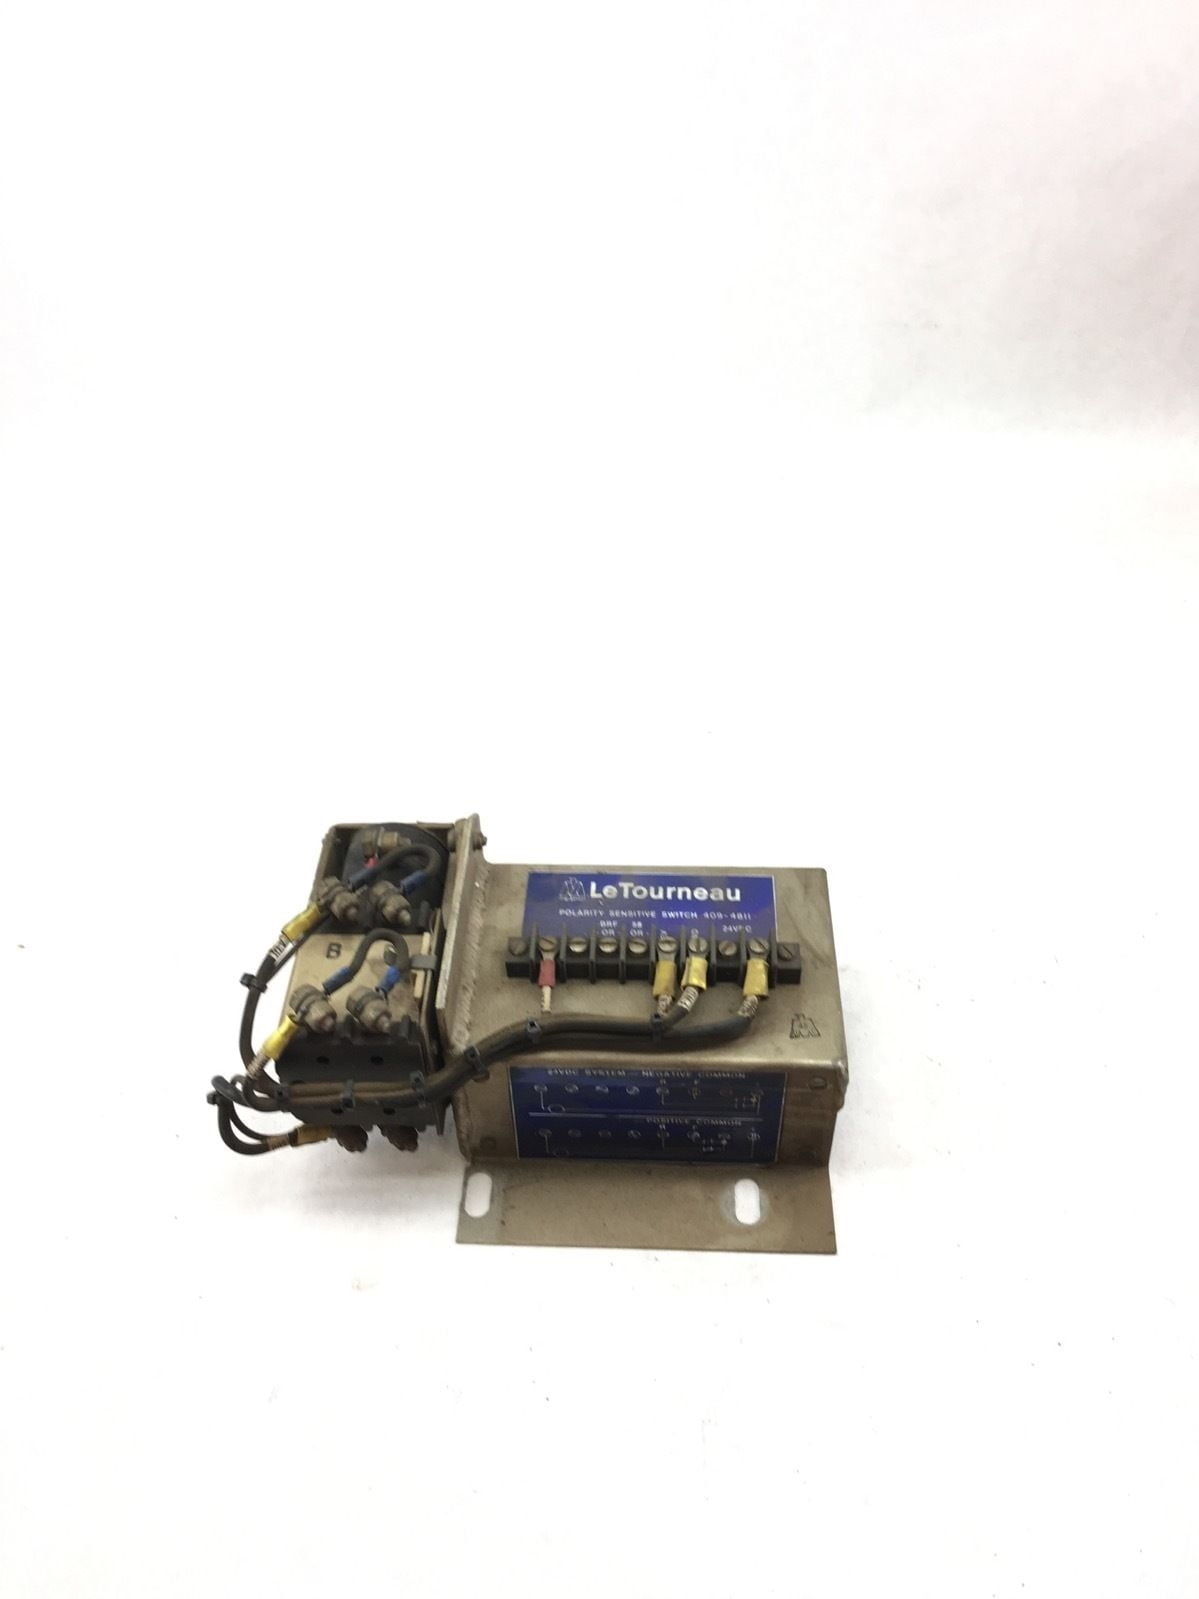 Letourneau 409 4811 Polarity Sensitive Switch With Vapor 35030479 Relay 22214 001